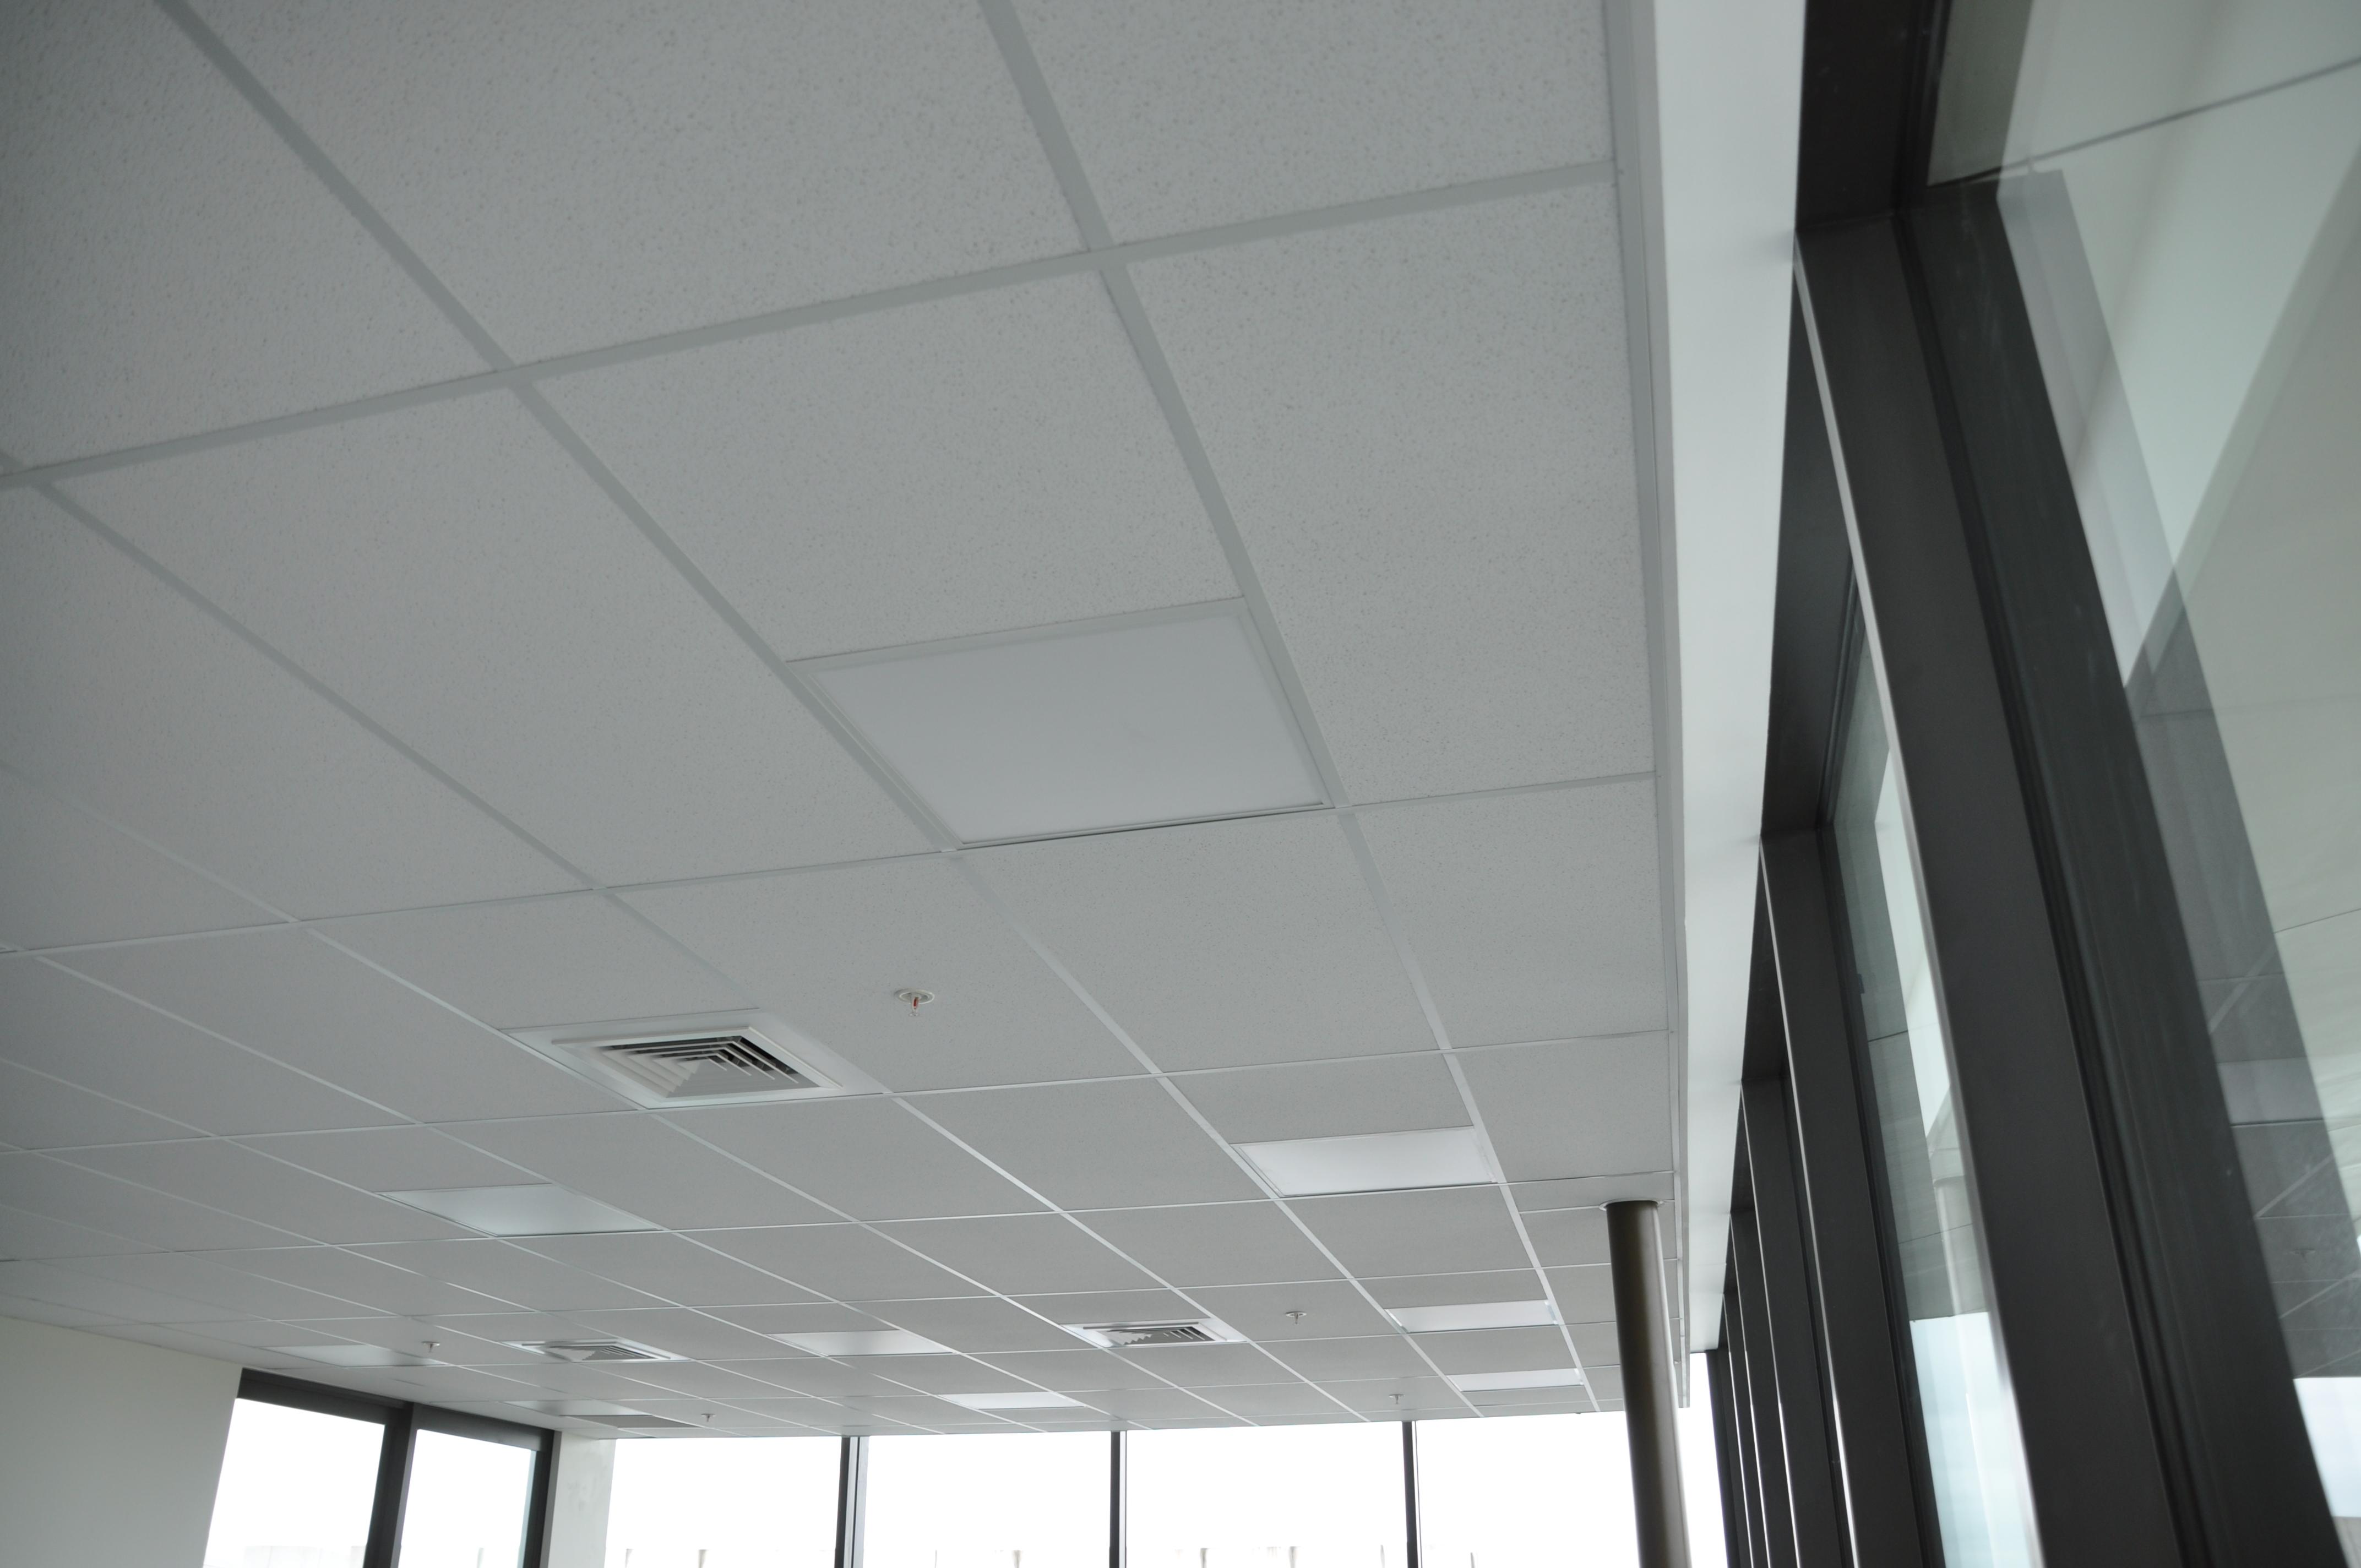 hemlock pictured reclaimed wood lumber pin industrial also panels skip ceilings planed paneling longleaf ceiling